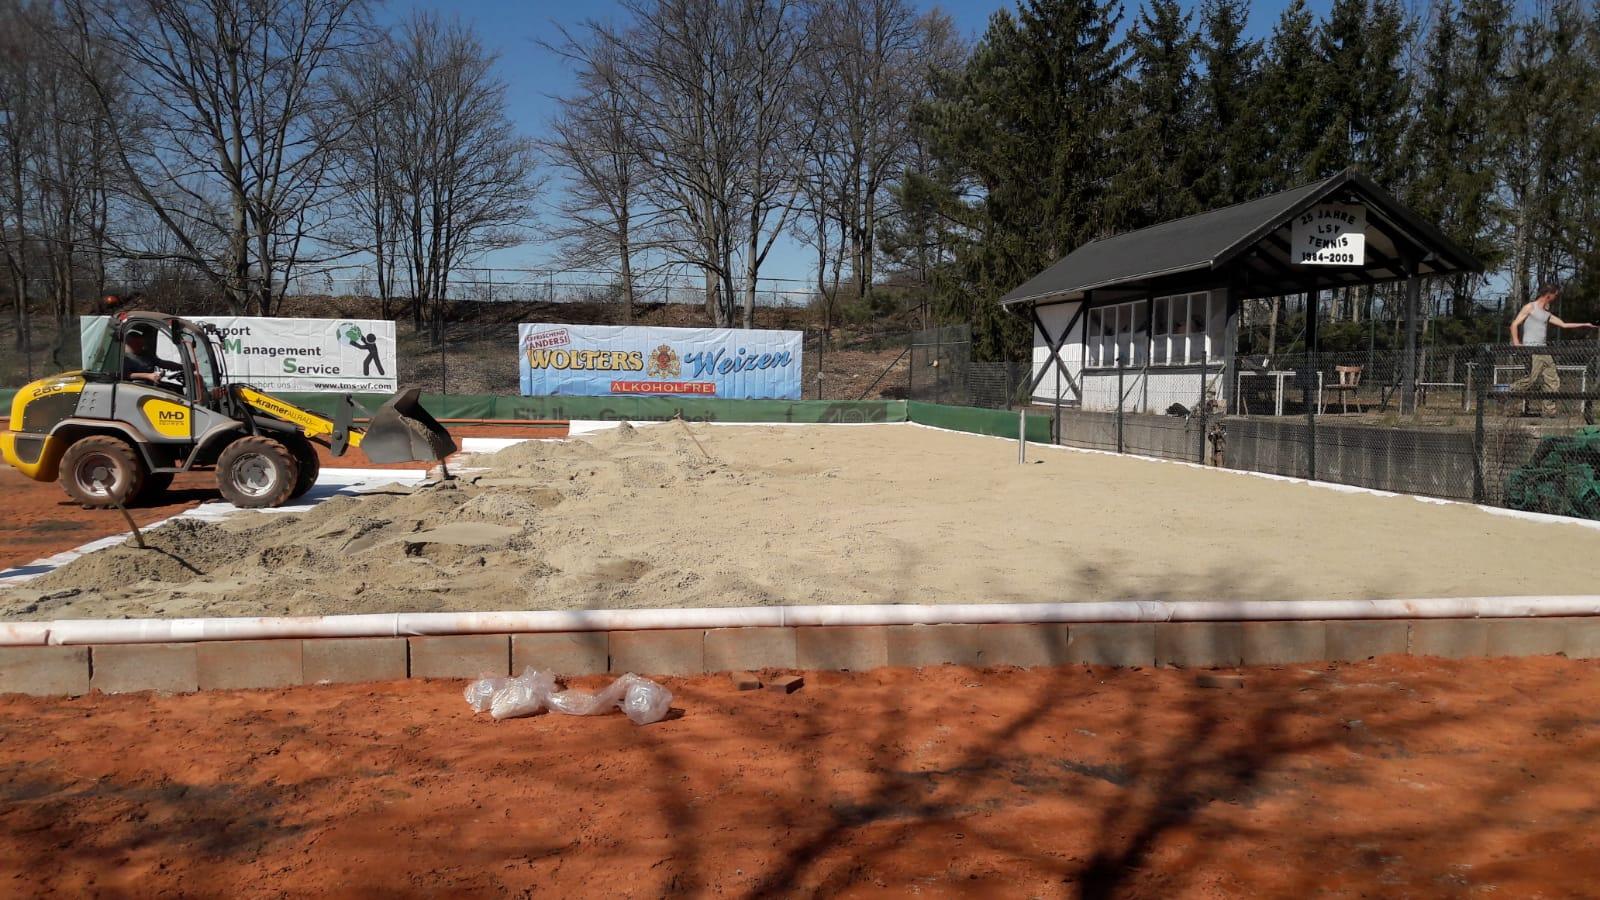 Tag 2 der Sandaktion